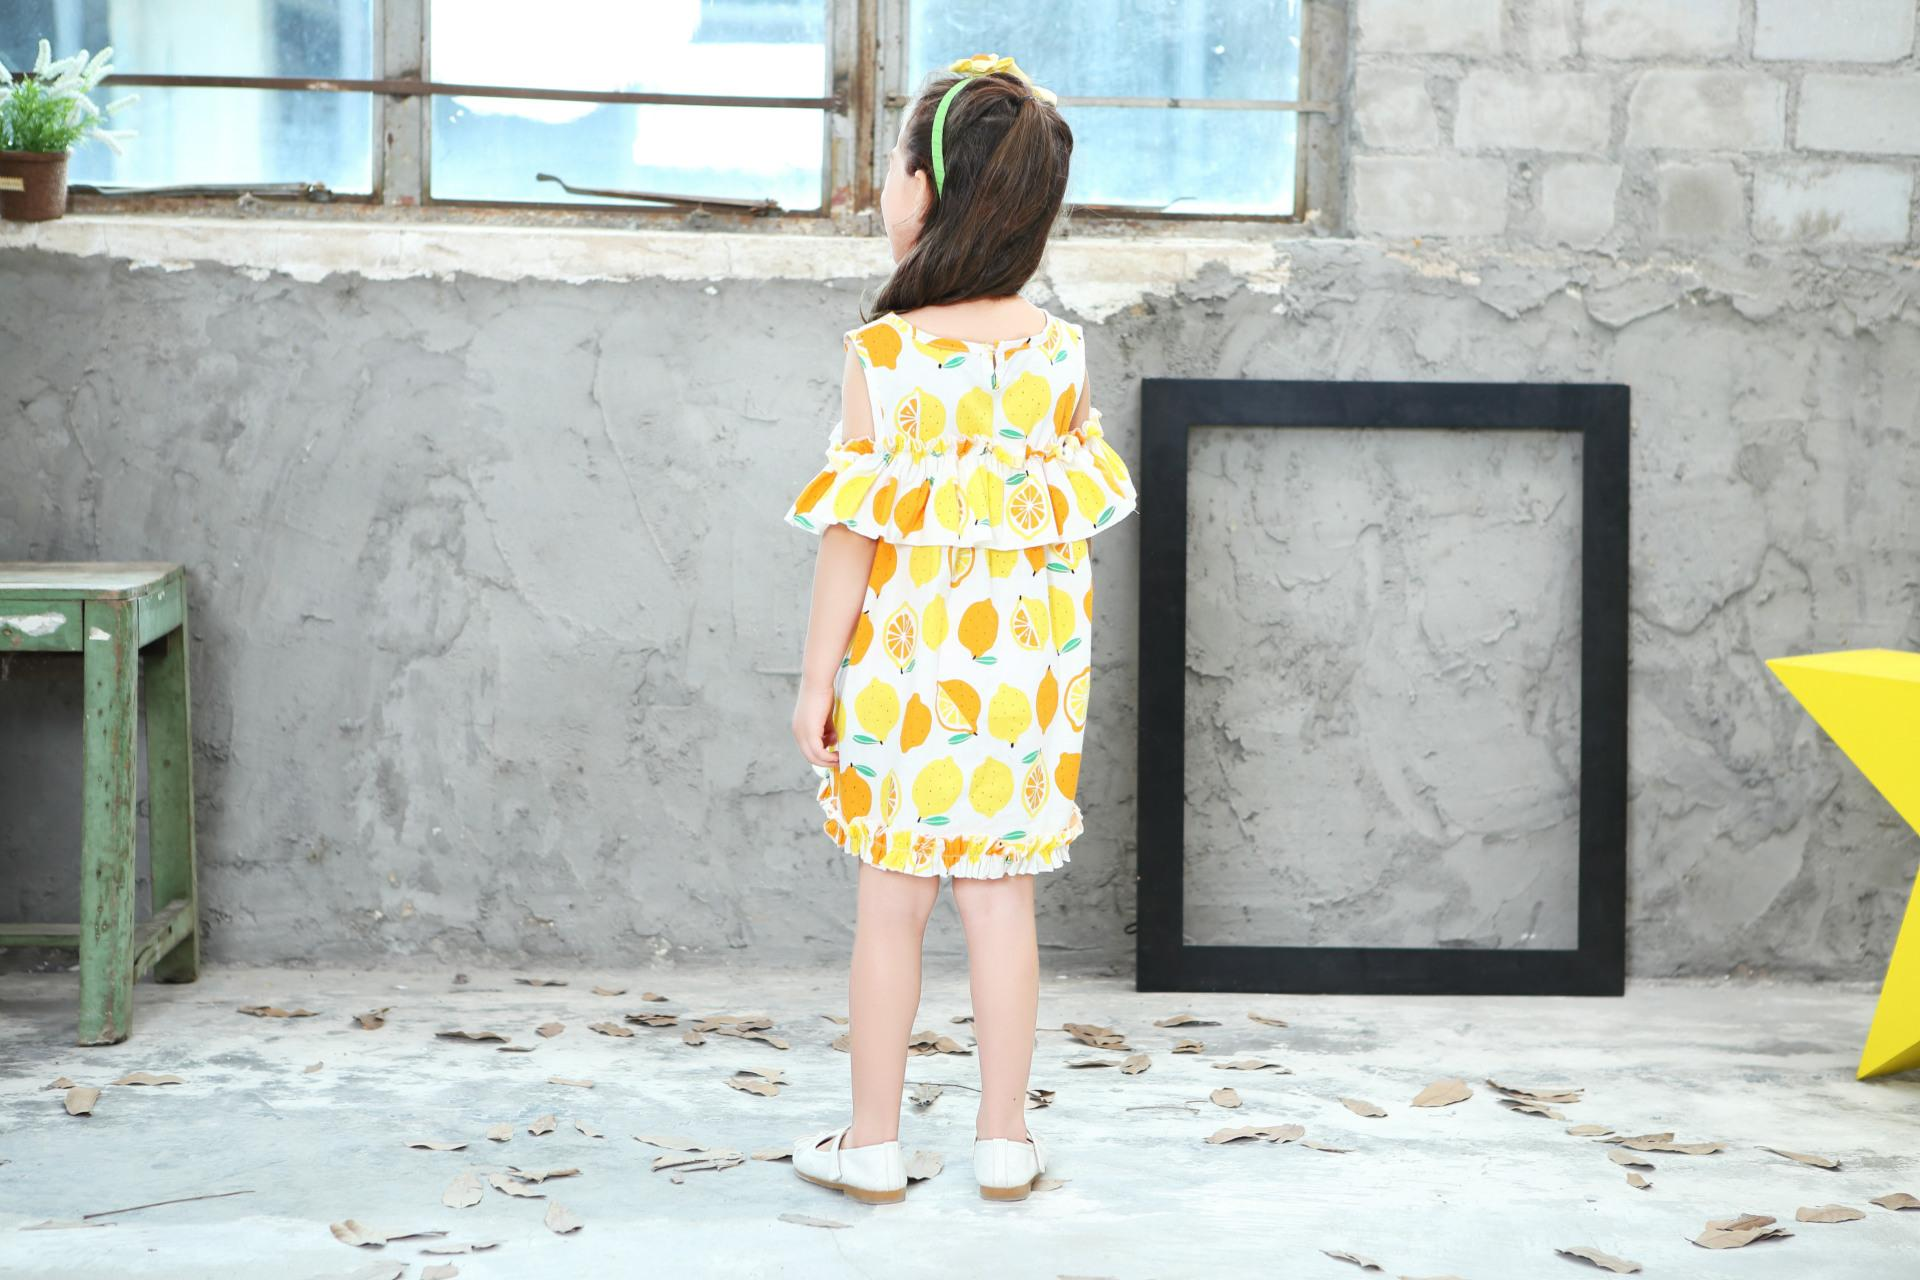 Lemon Printd Girls Dress 2018 New Summer Fashion Children Princess Dress Kids Children Clothes For 2 3 4 5 6 7 8 Years 8